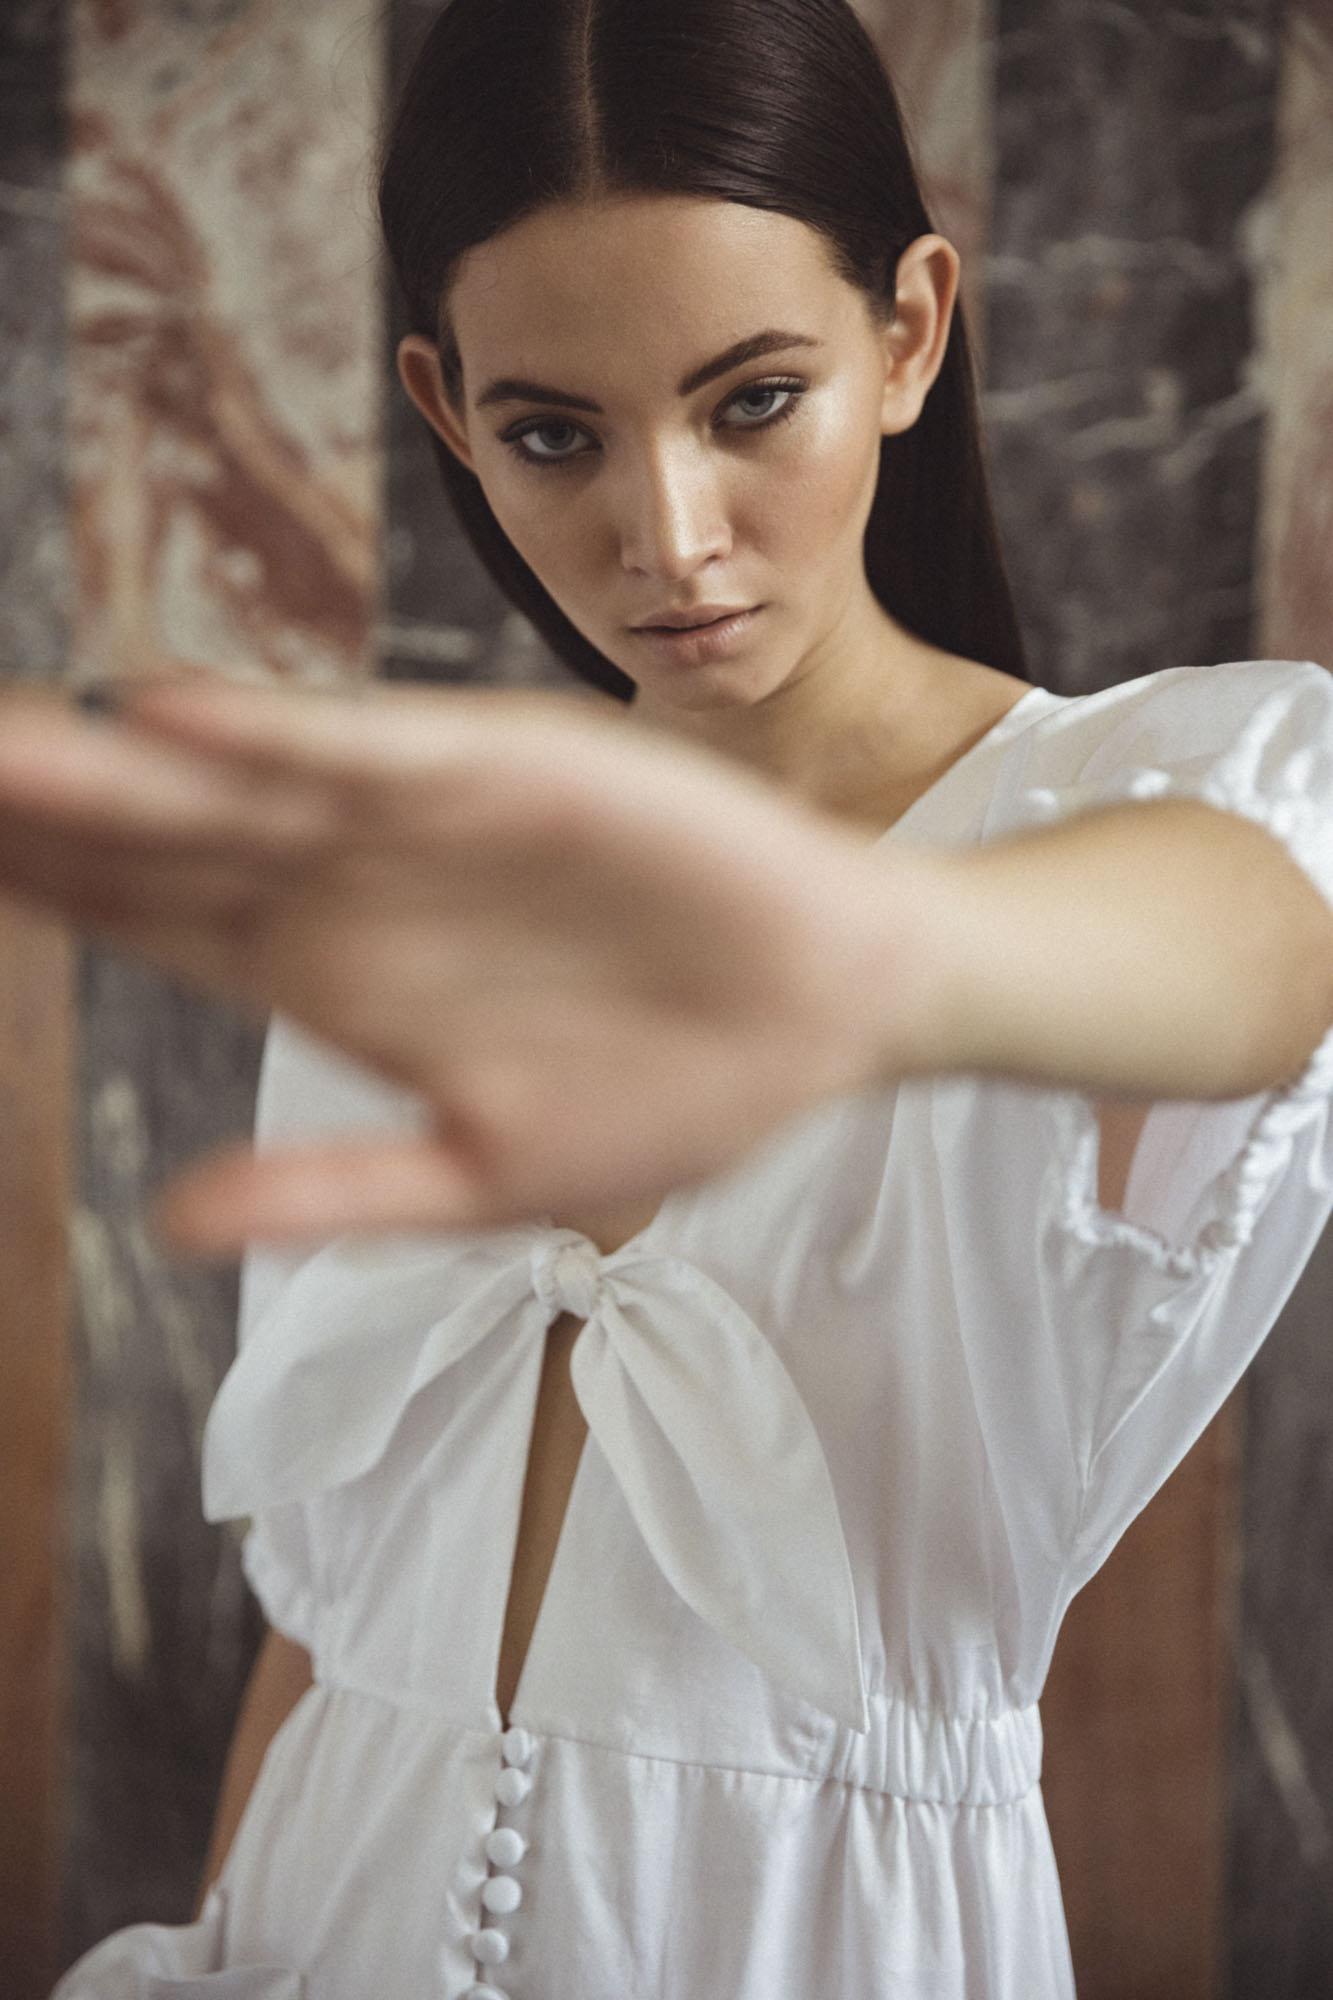 efrain_mogollon_femineus_alessia_ dress2.JPG